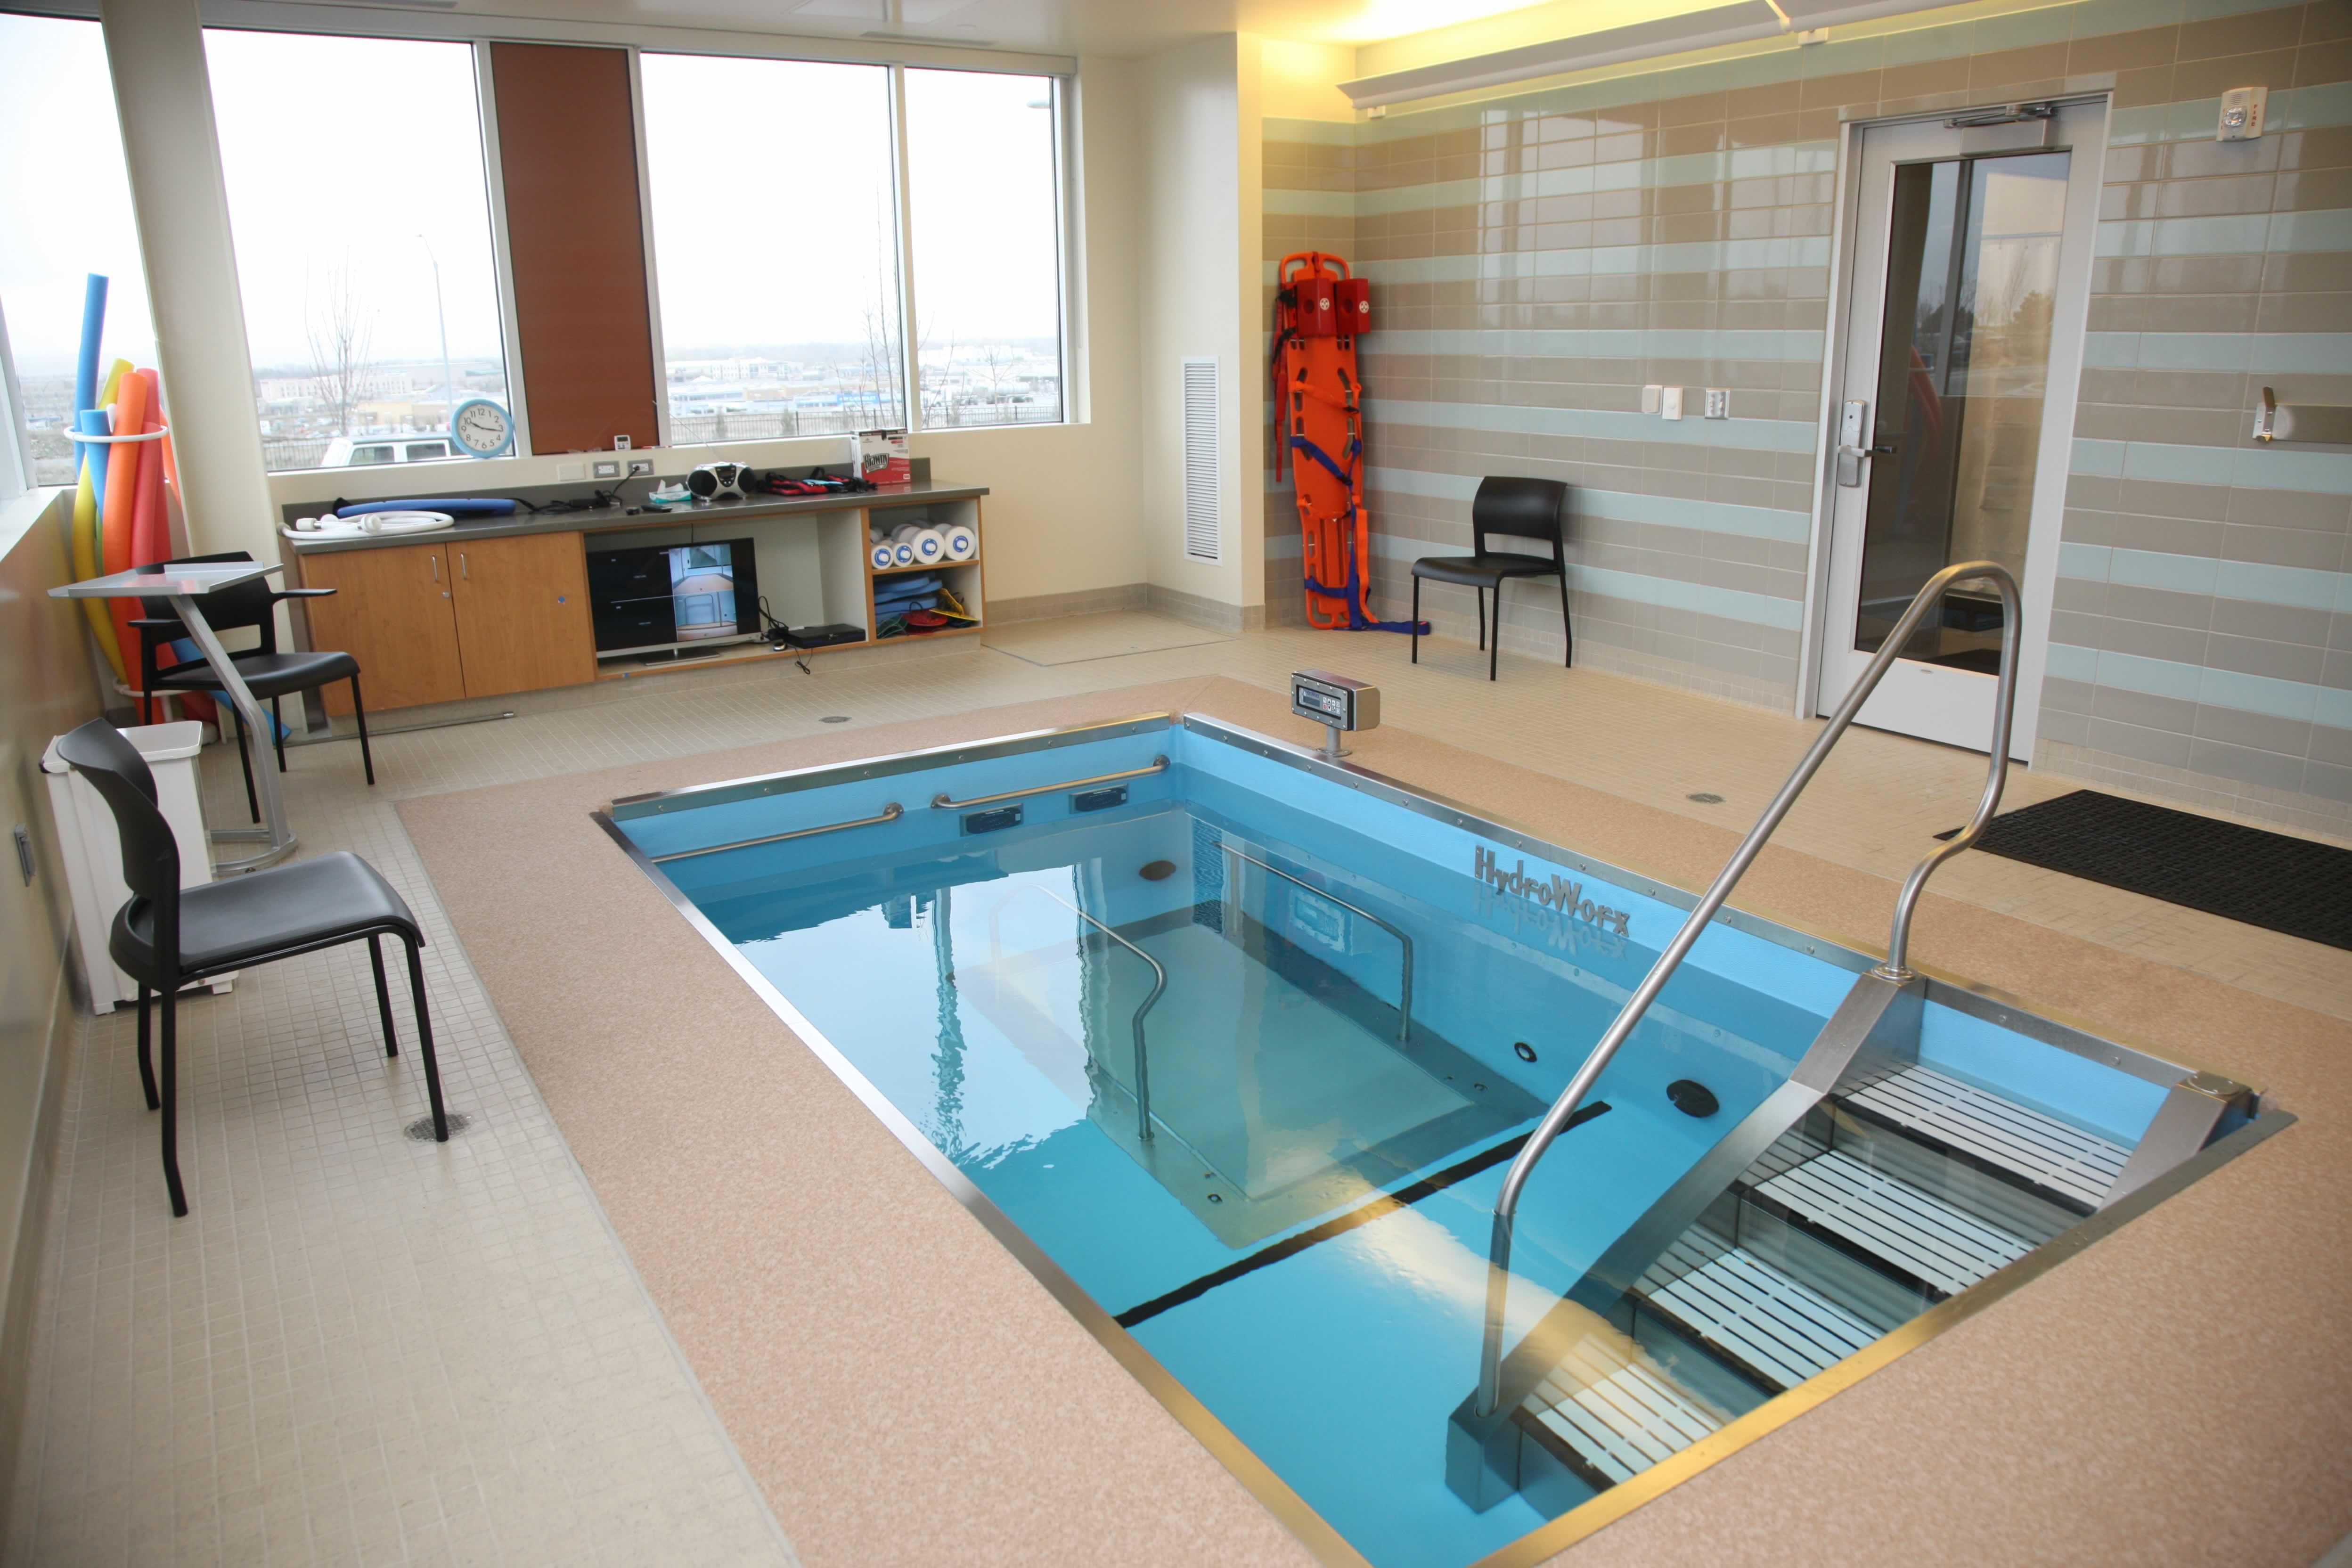 Physical Therapy Nampa Idaho Saint Alphonsus Rehabilitation Services